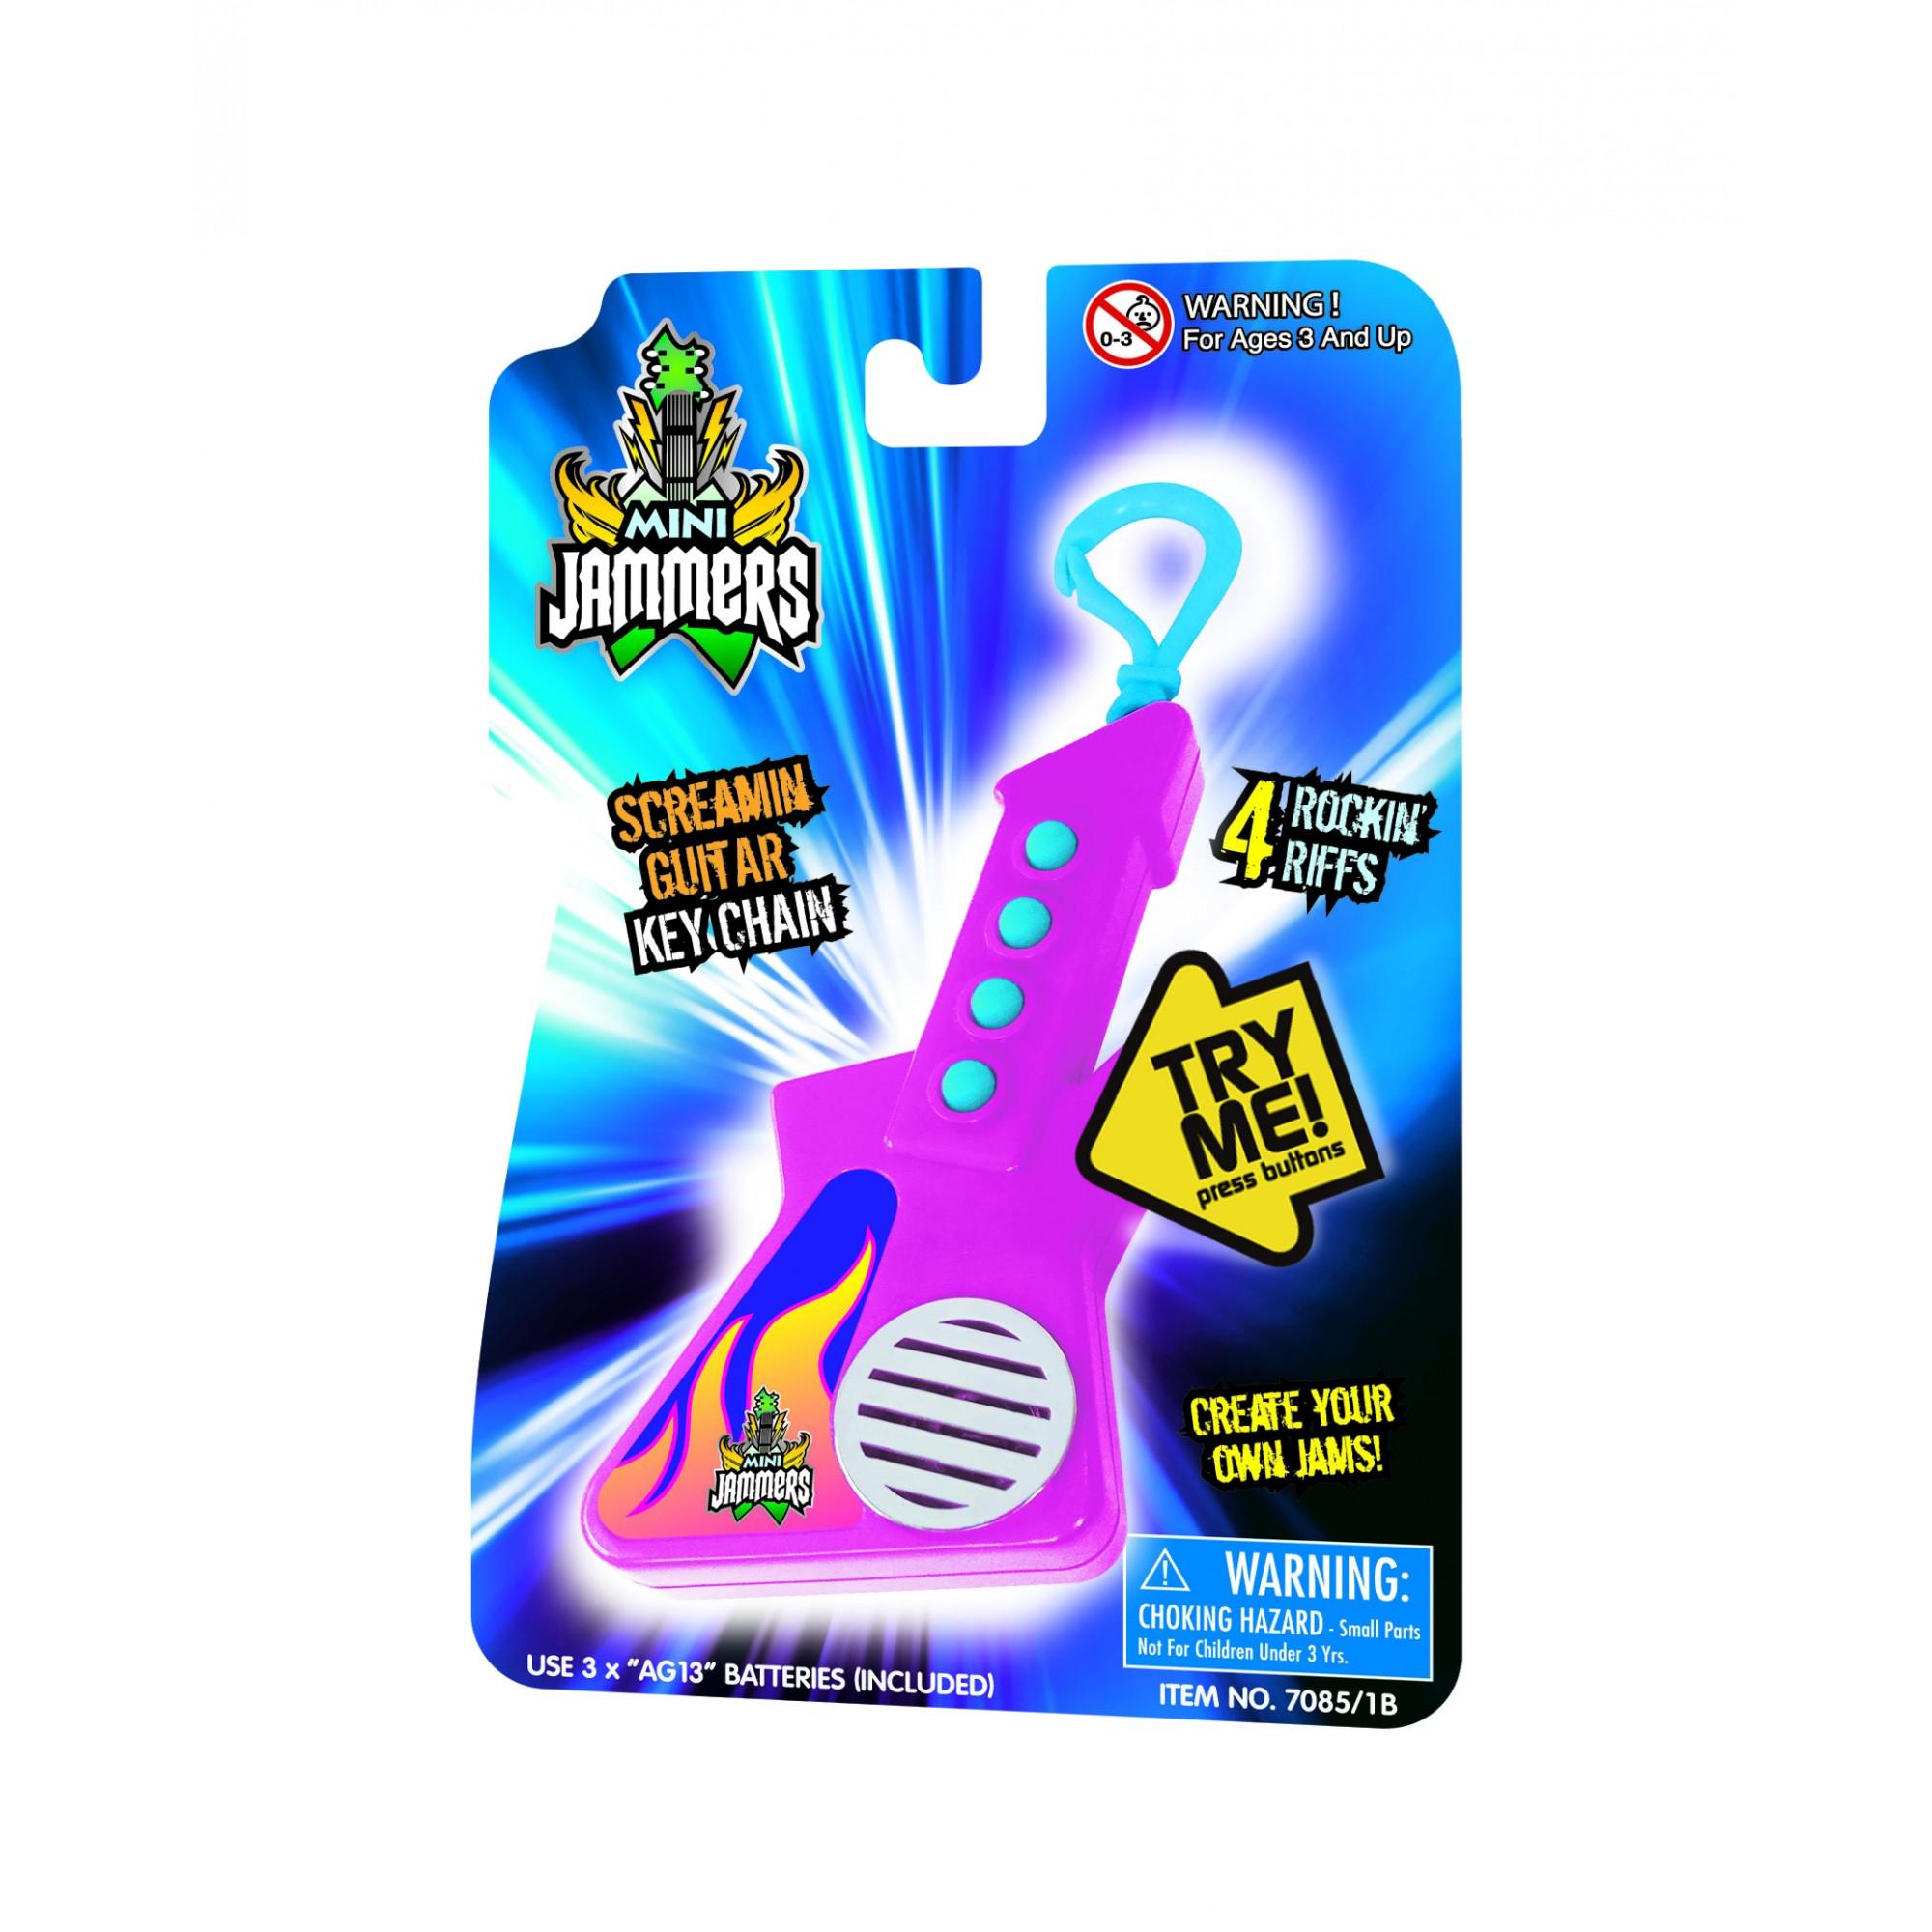 Mini Jammers - Screamin Guitar Keychain